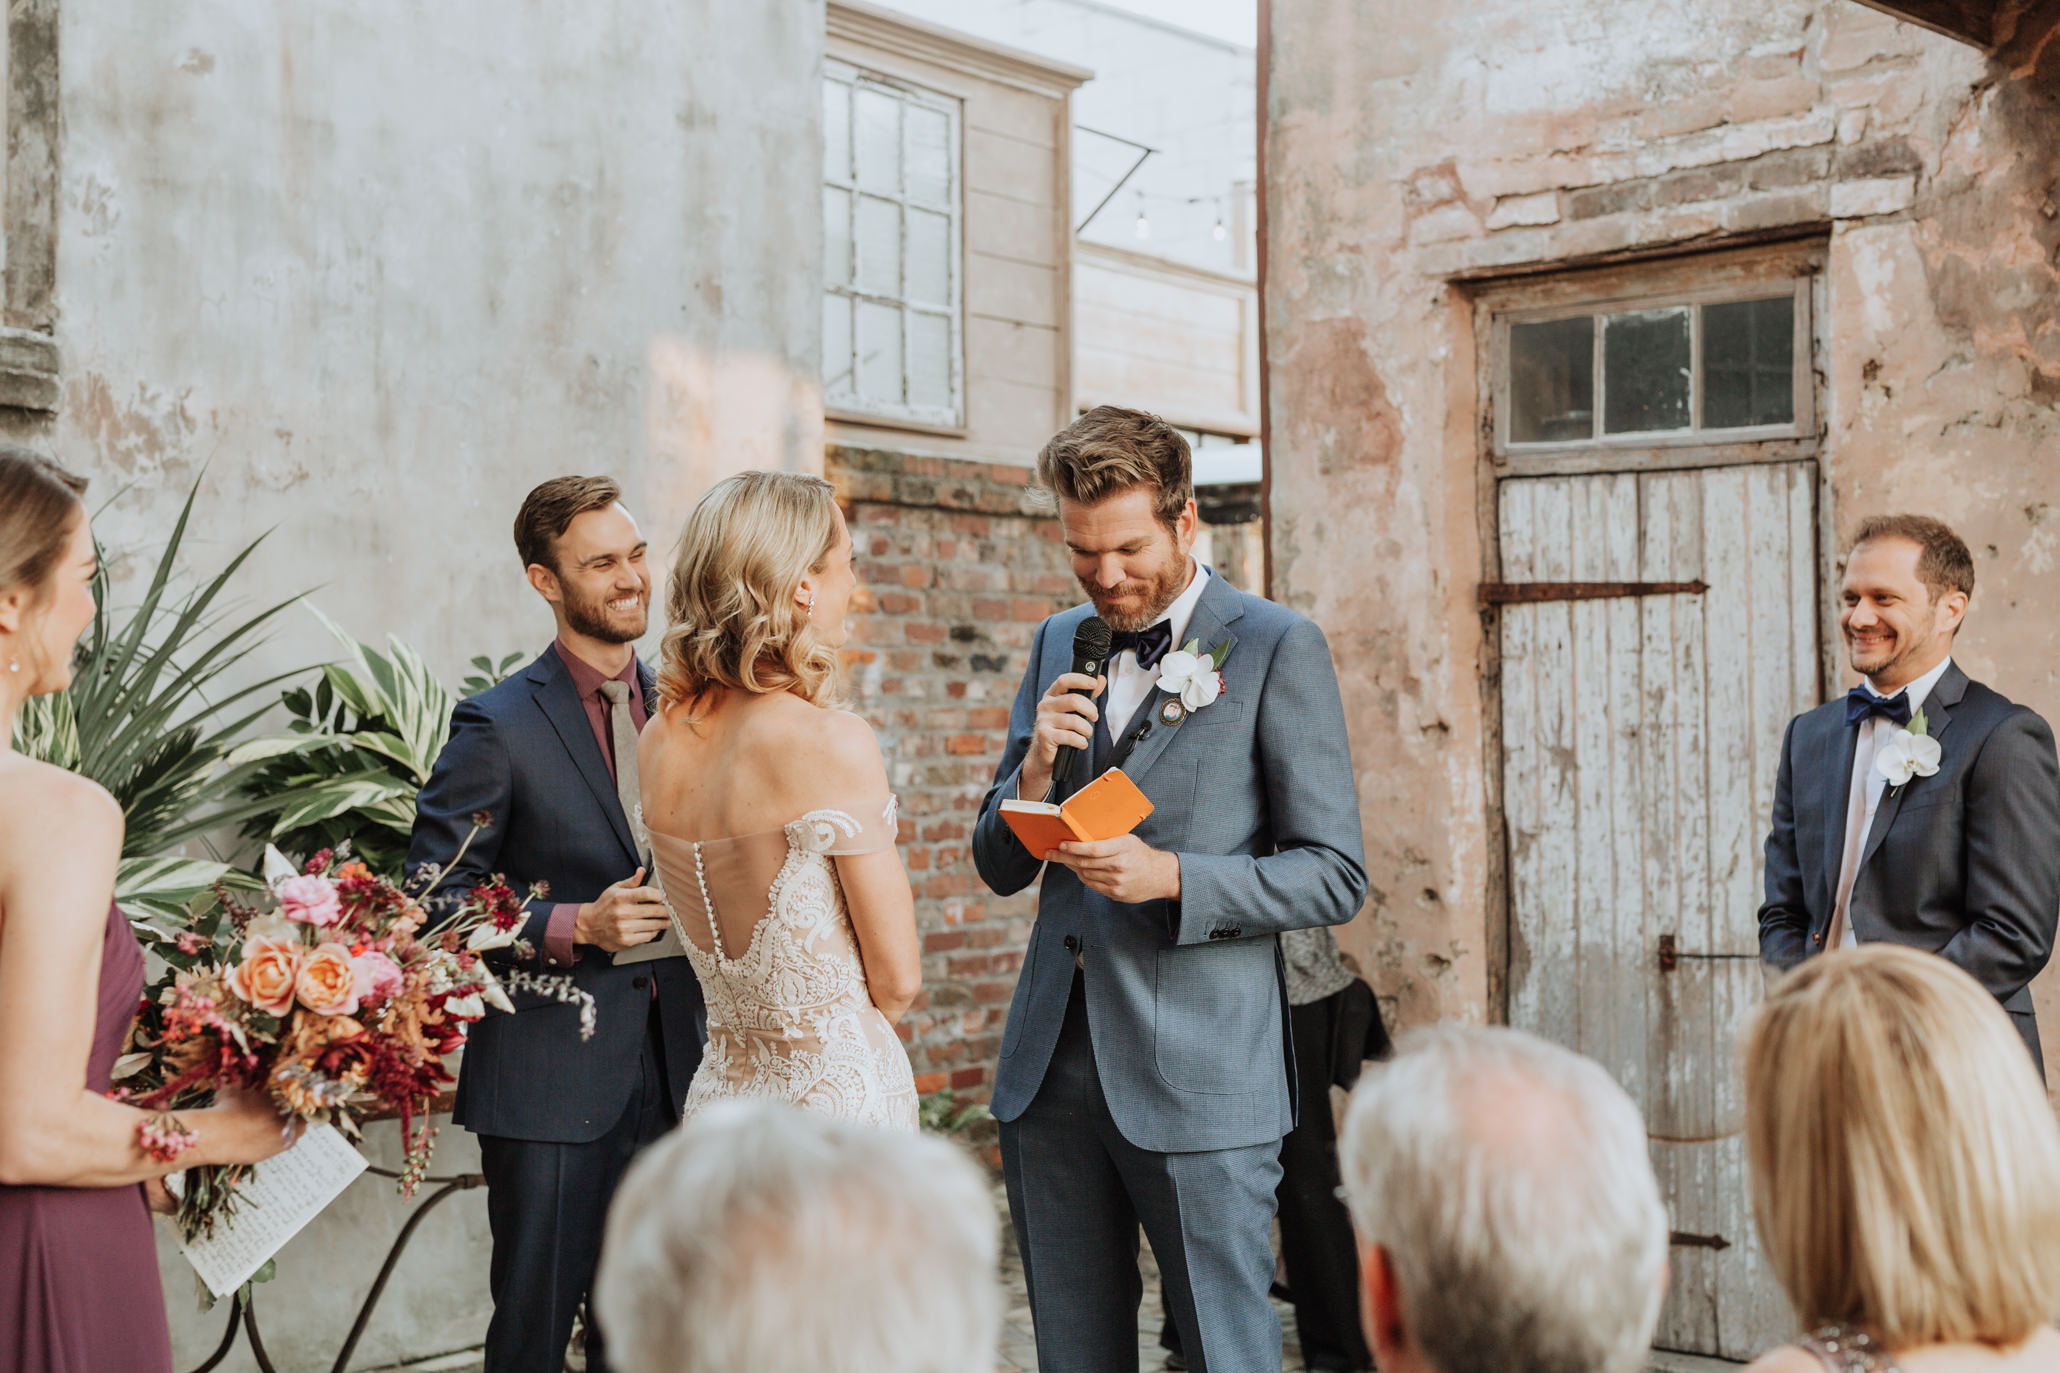 race religious wedding new orleans-66.jpg